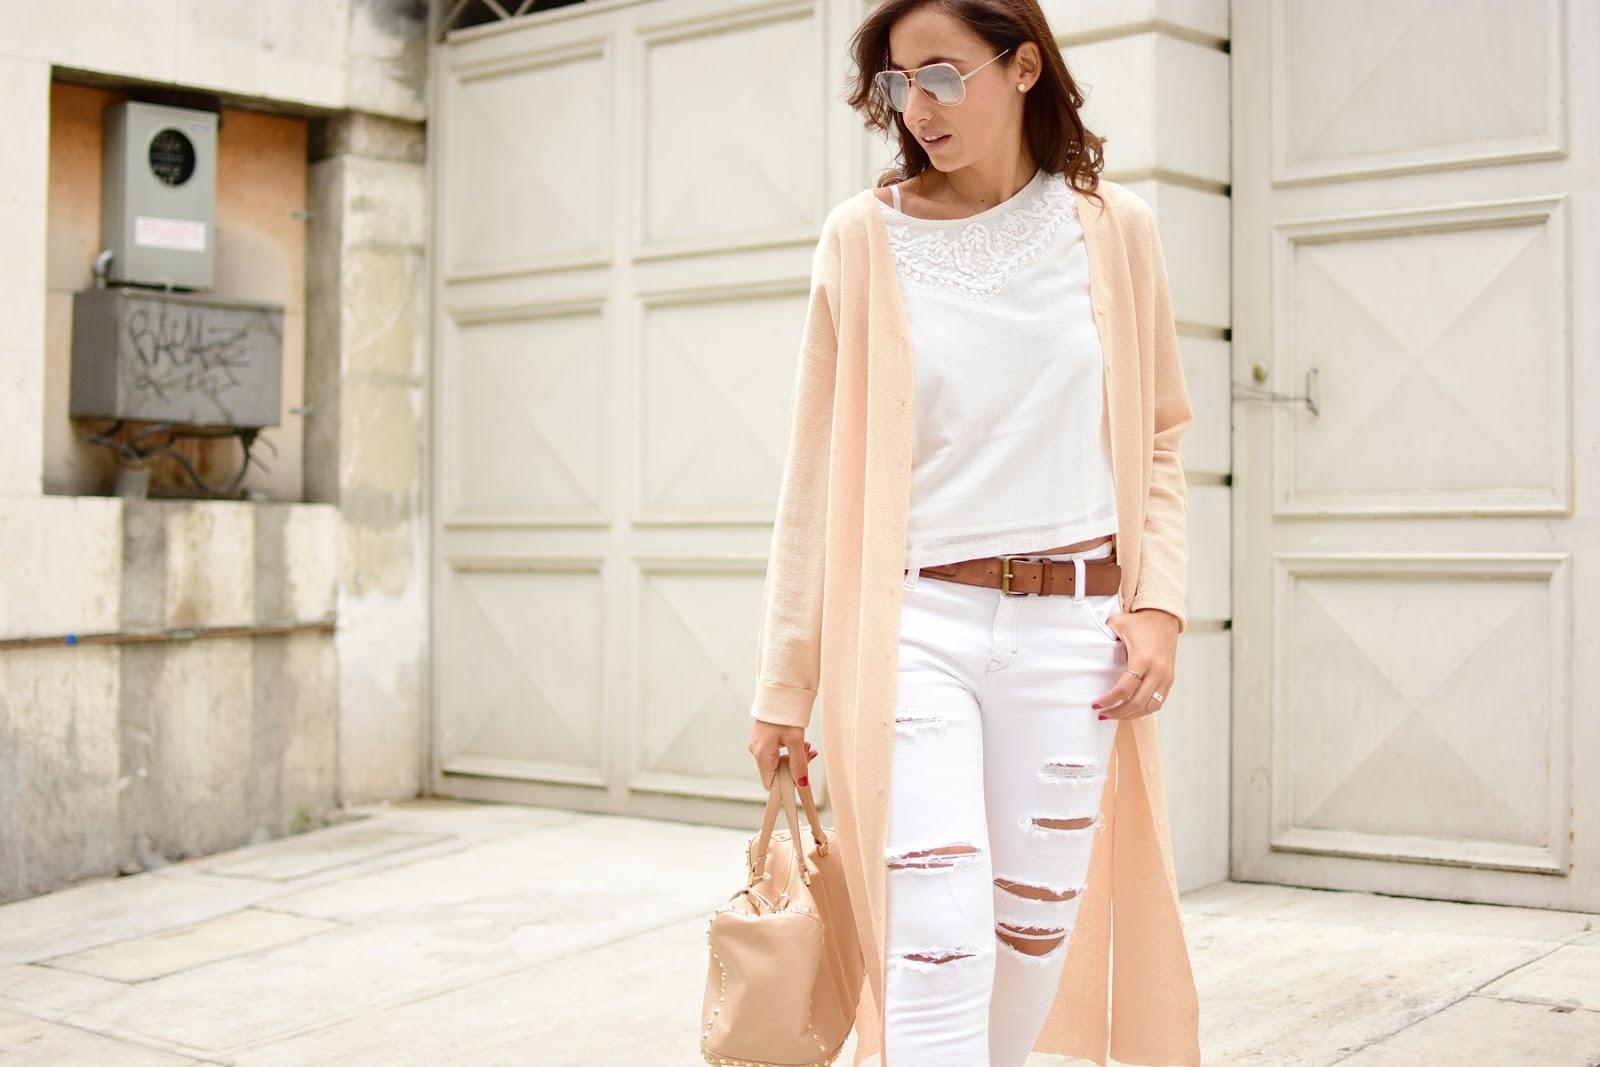 el-blog-de-silvia-rodriguez-streetstyle-blogger-summer-maxi-cardigan-adolfo-dominguez-influencer-blog-de-moda-15